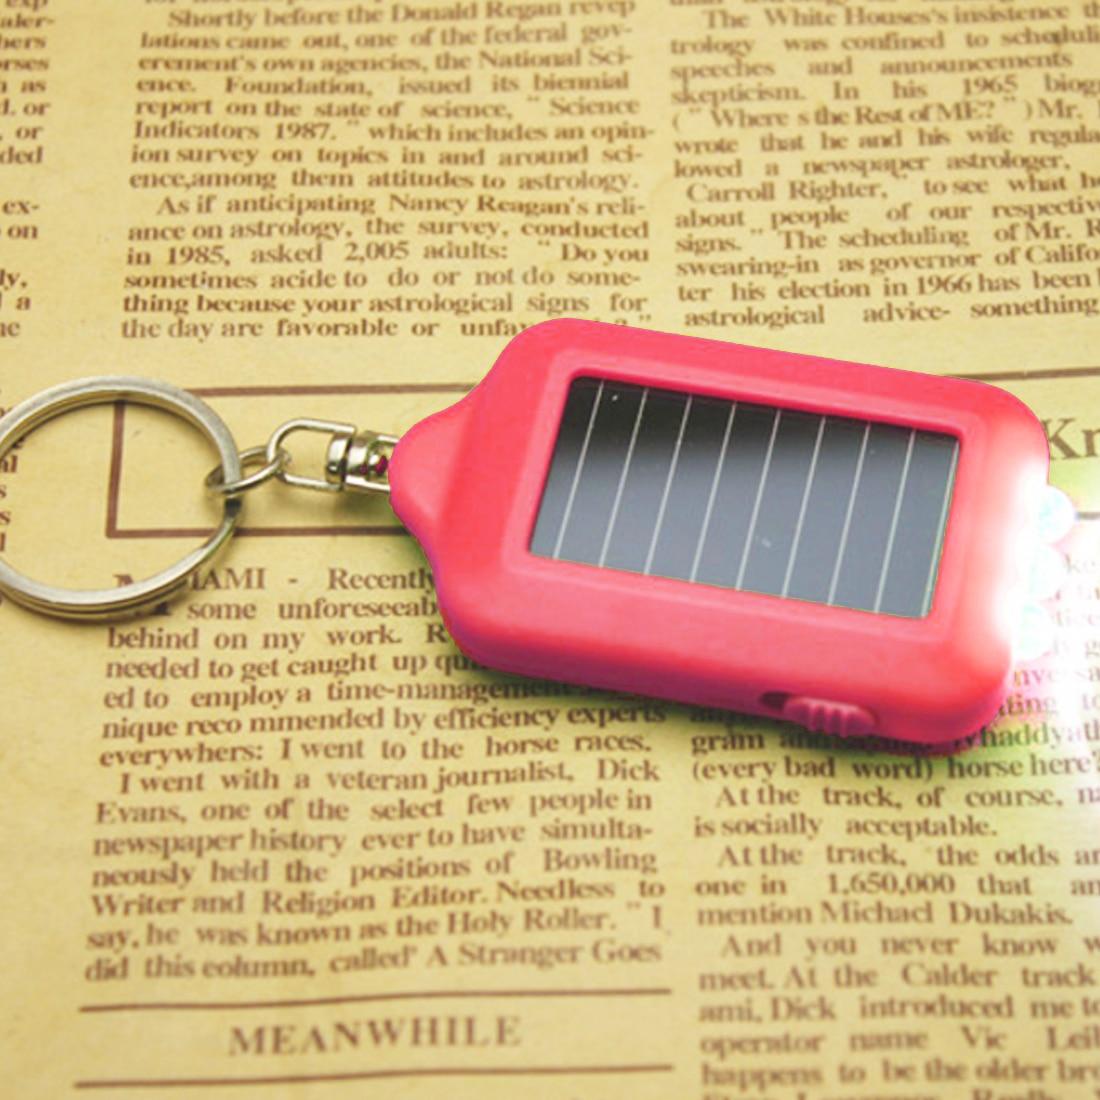 Flashlight 3 LEDs Solar Panel Sun Power Energy Torch Camping Light Portable Key Chain Hiking Rechargeable Spotlight Lamp